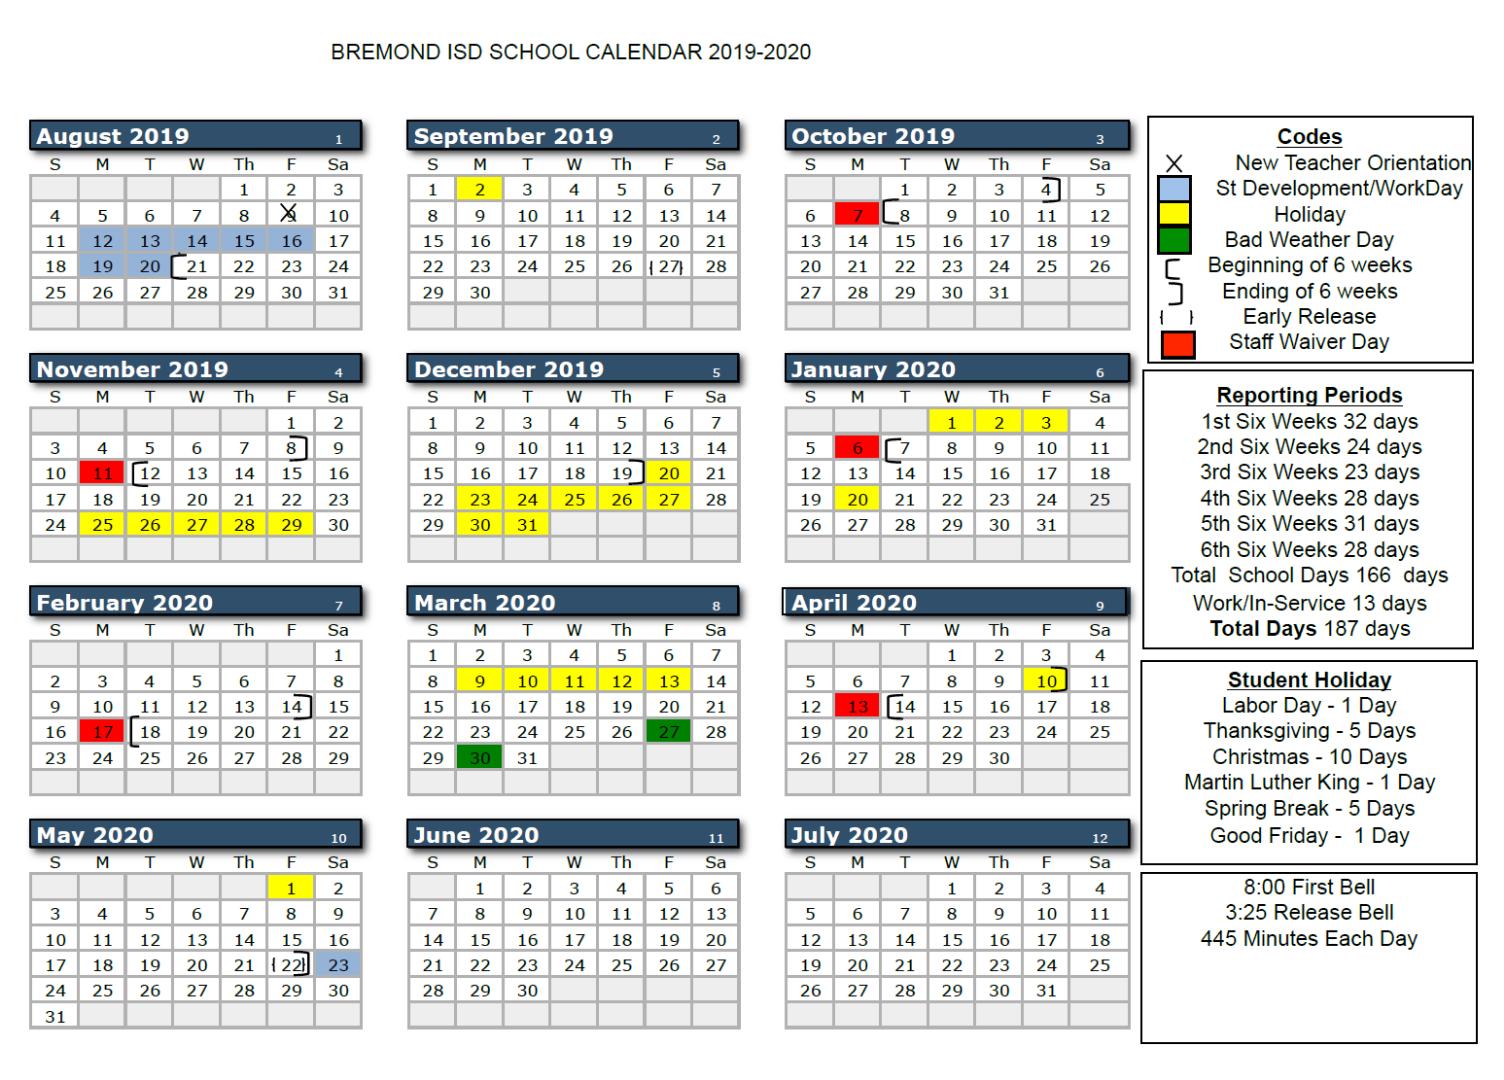 Bremond Isd – 2019 2020 Bisd School Calendar Regarding Santa Teresa High School Calendar 2021